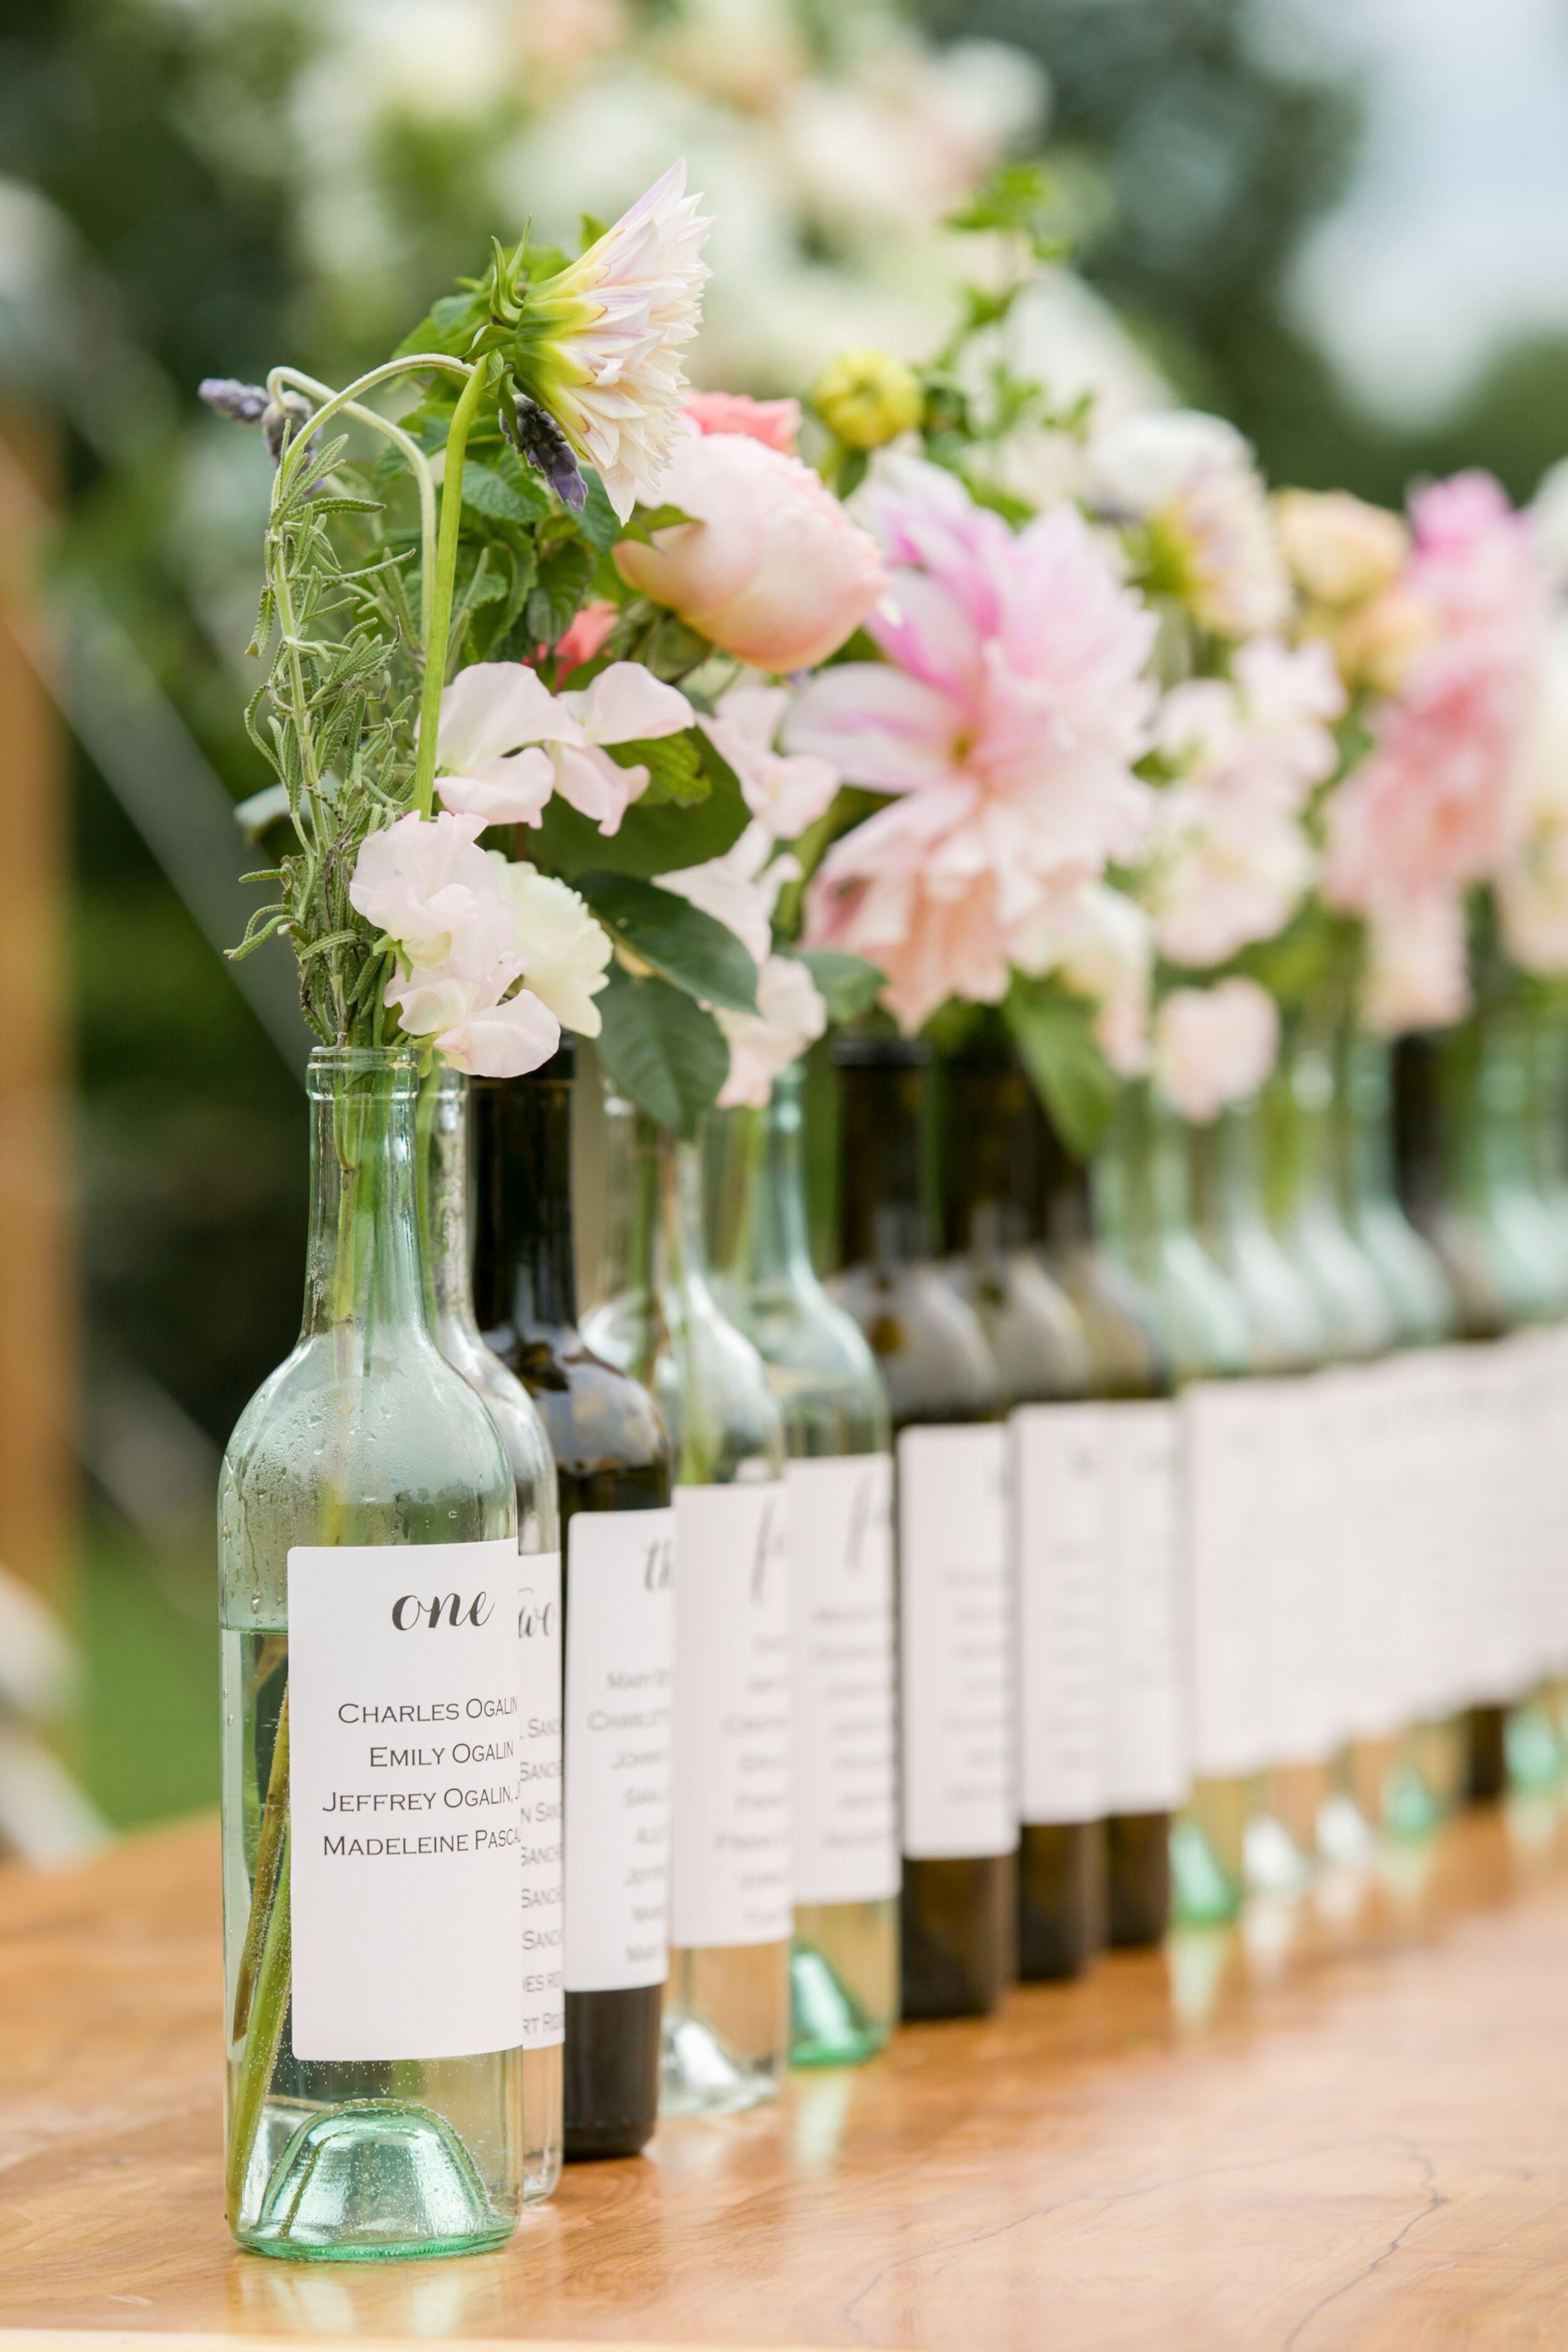 Wedding Table Wine Bottle Wedding Table Decorations wine bottle bud vase table assignments